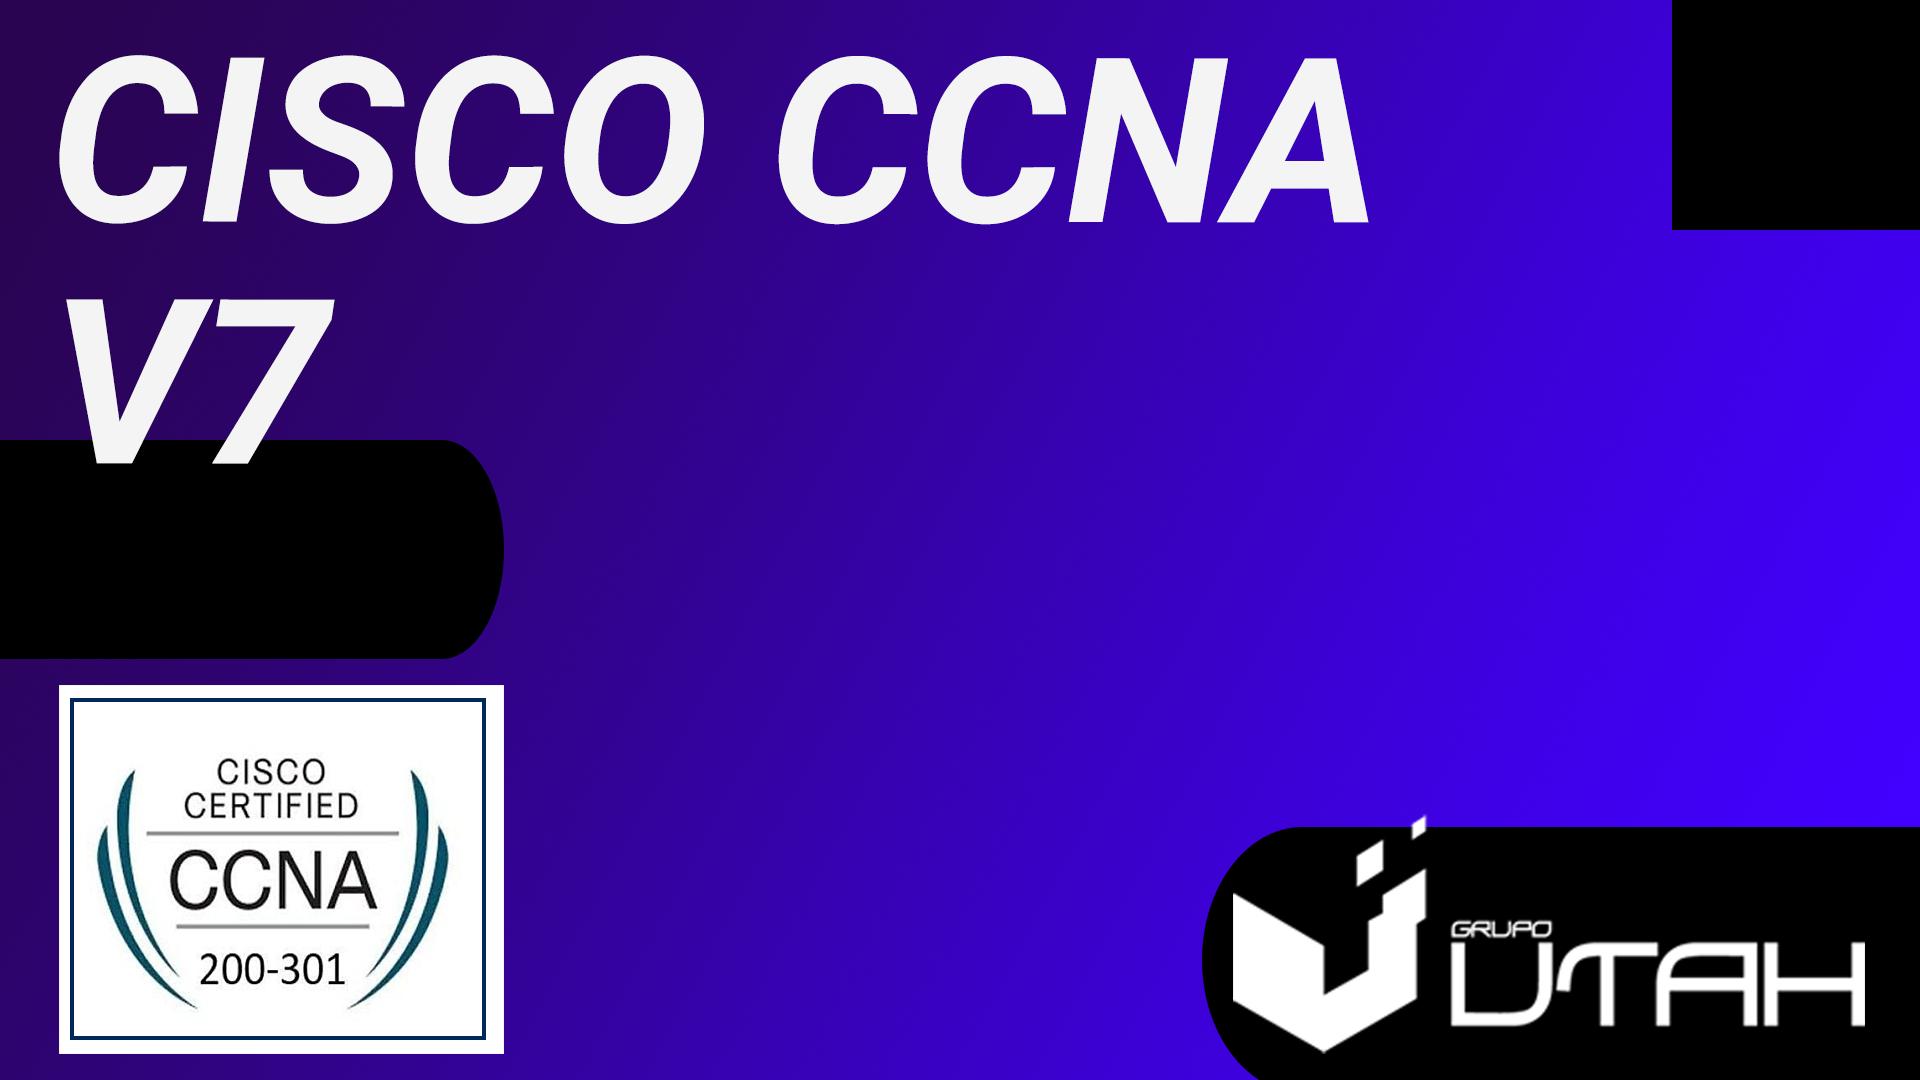 CISCO - CCNA V7 -N5 - 2021